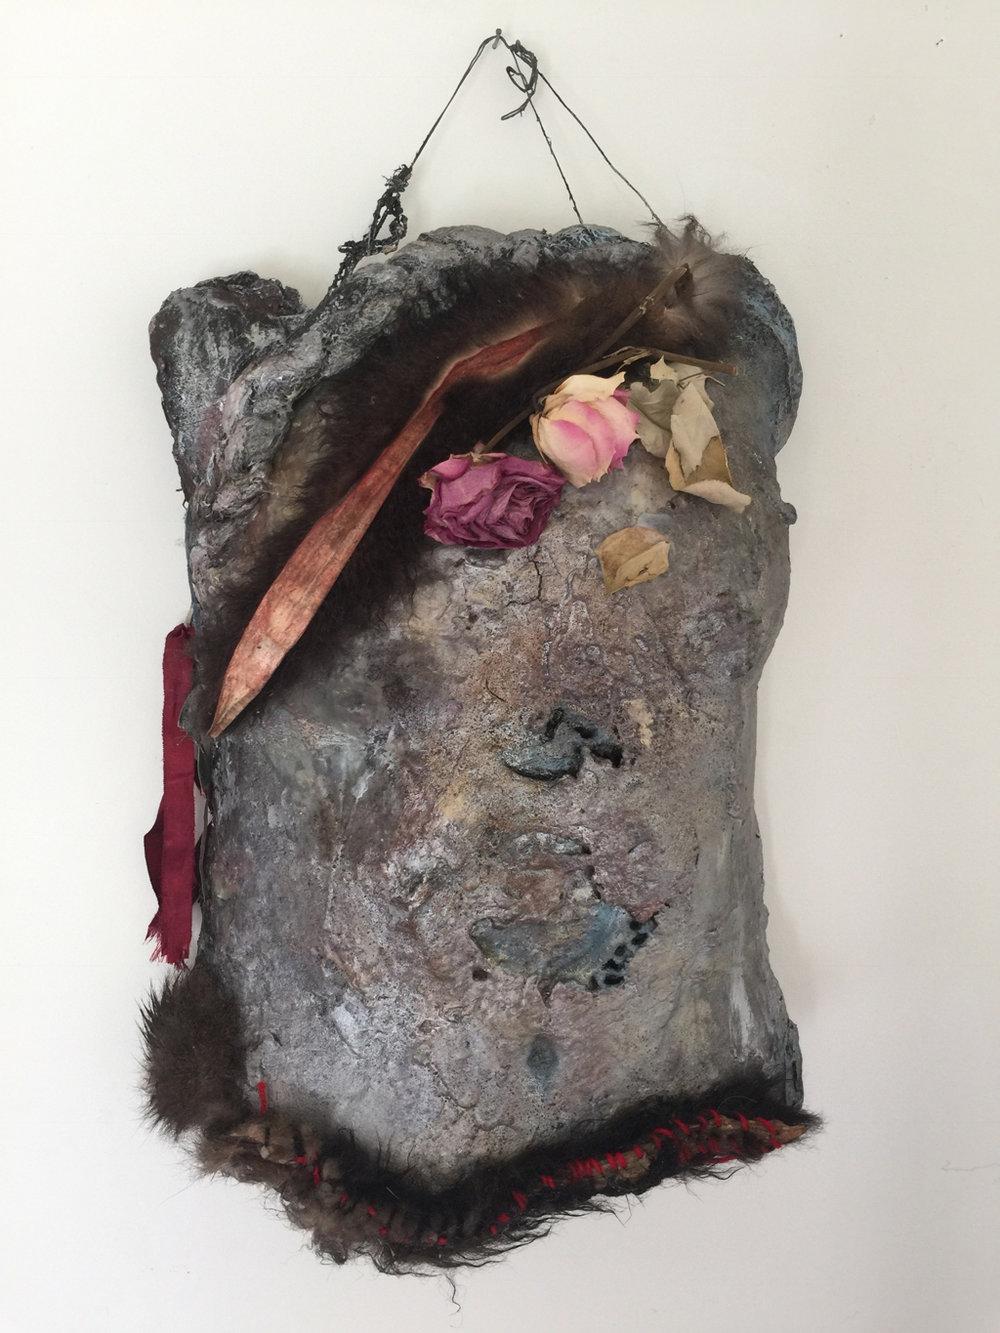 Belong - Sarah Jane MooreShield and Armour (2016), human hair, possum tails, roses, ribbon and resin body cast